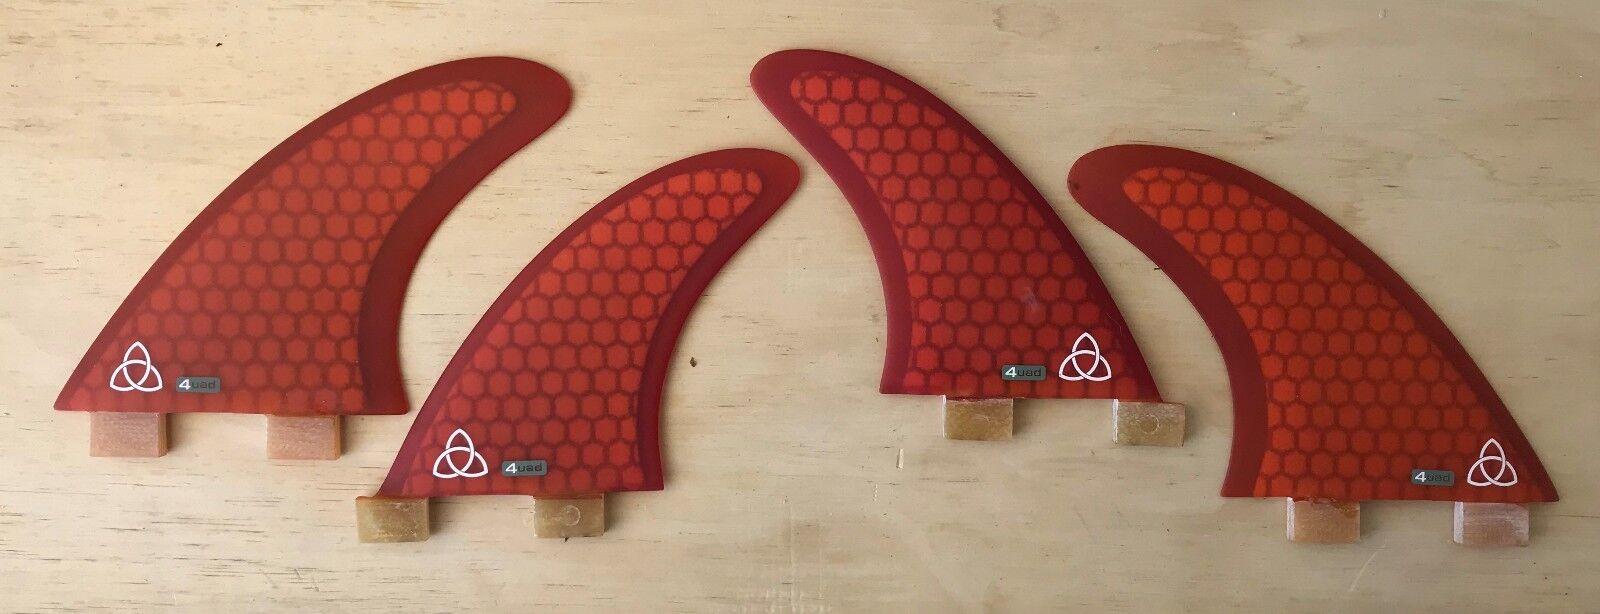 Medium Fiberglass Surfboard Fins - Quad (Set of 4) orange, FCS